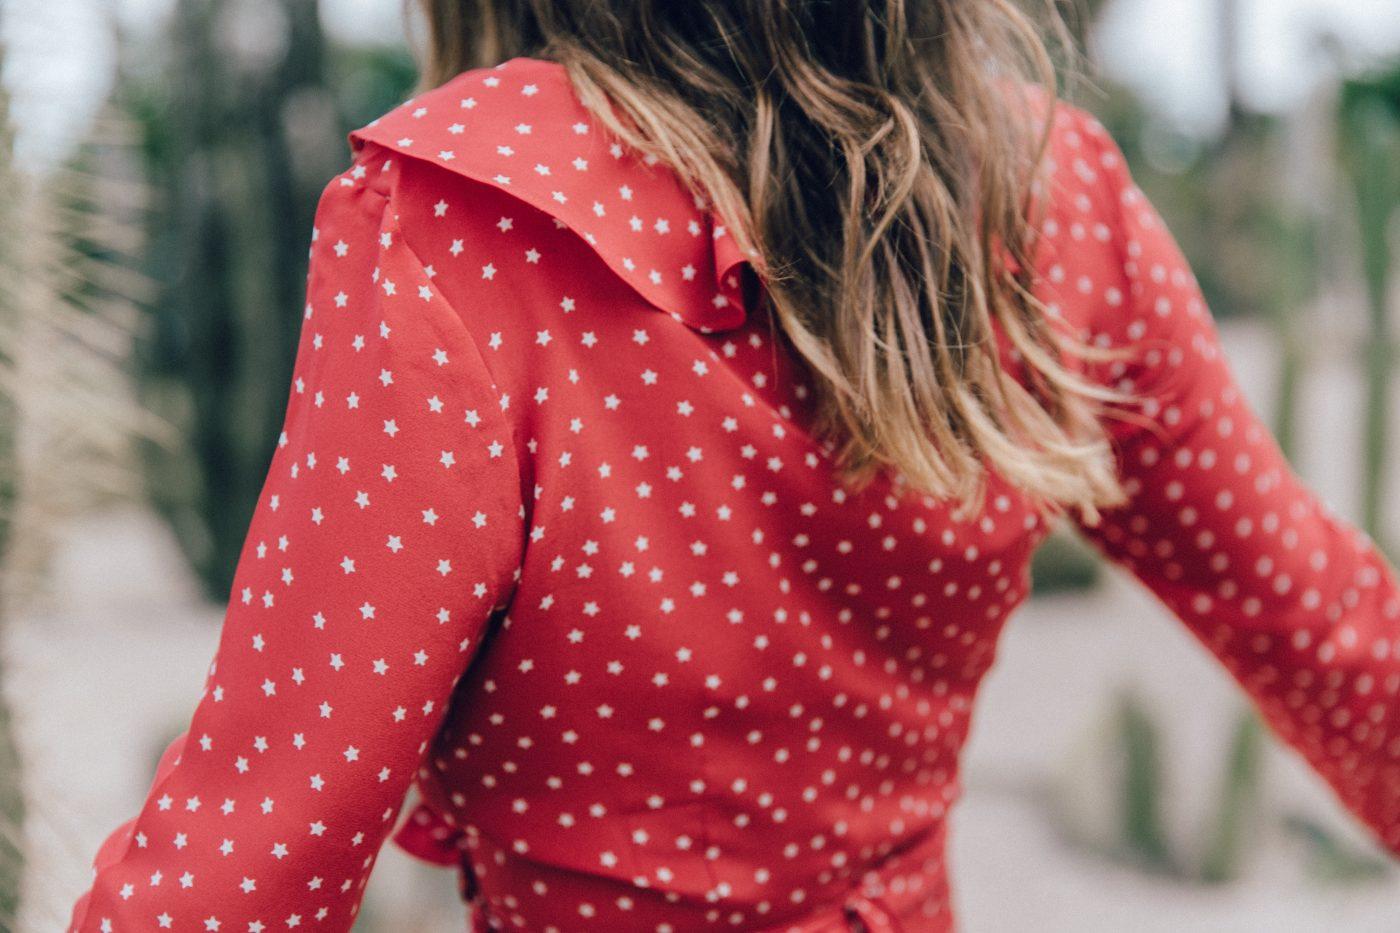 Realisation_Par_Dress-Star_Print-Red_Dress-Outfit-Catonier-Hat-Lack_Of_Color-Black_Sandals_Topshop-Barcelona-Collage_Vintage-Mossen_Gardens-131